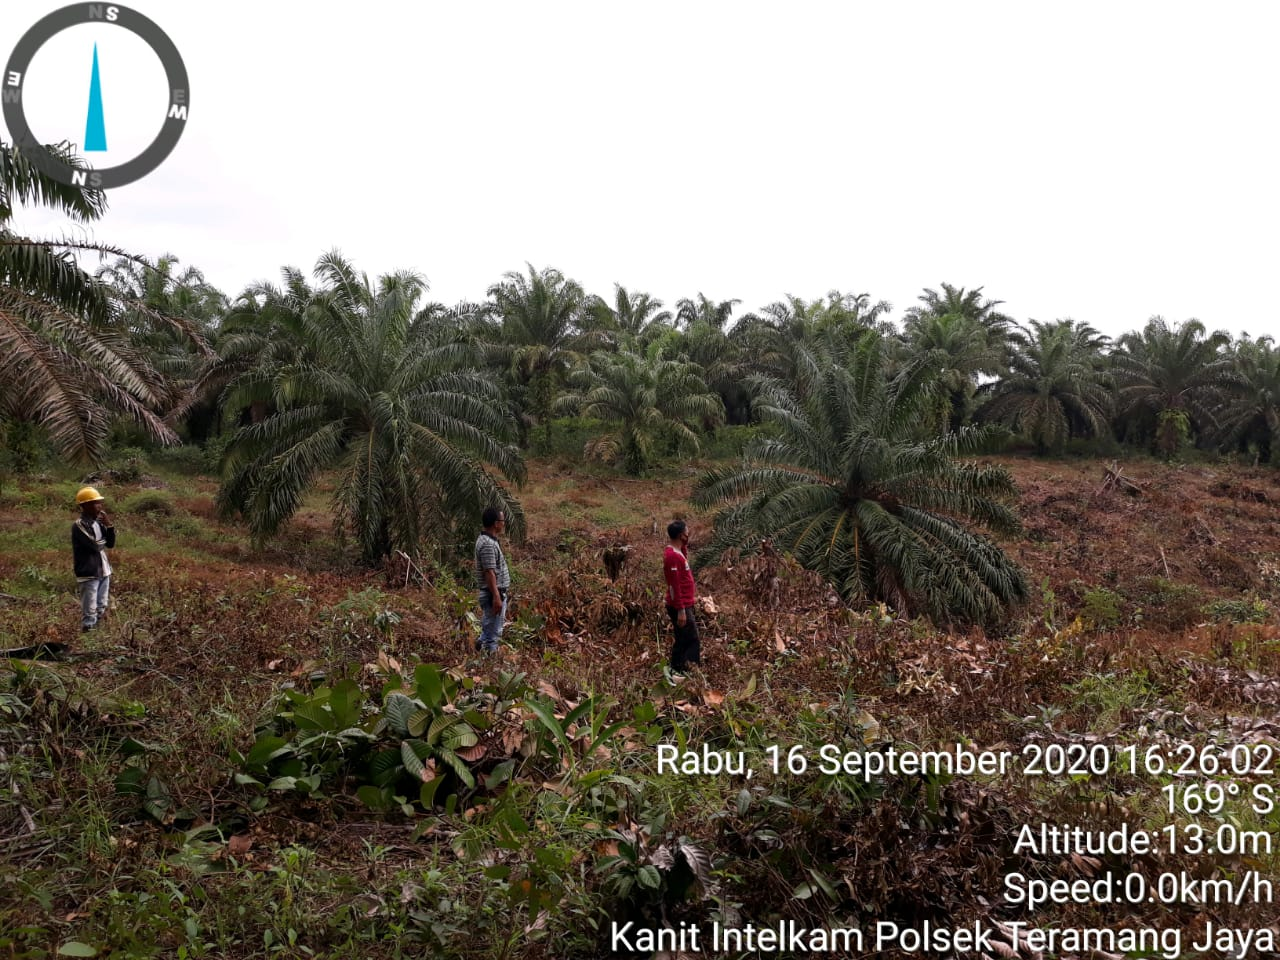 Lahan Ditebas Seluas 2 Hektar, Manager Pt. Agro Muko BTE Laporkan Ke Pihak Yang Berwajib